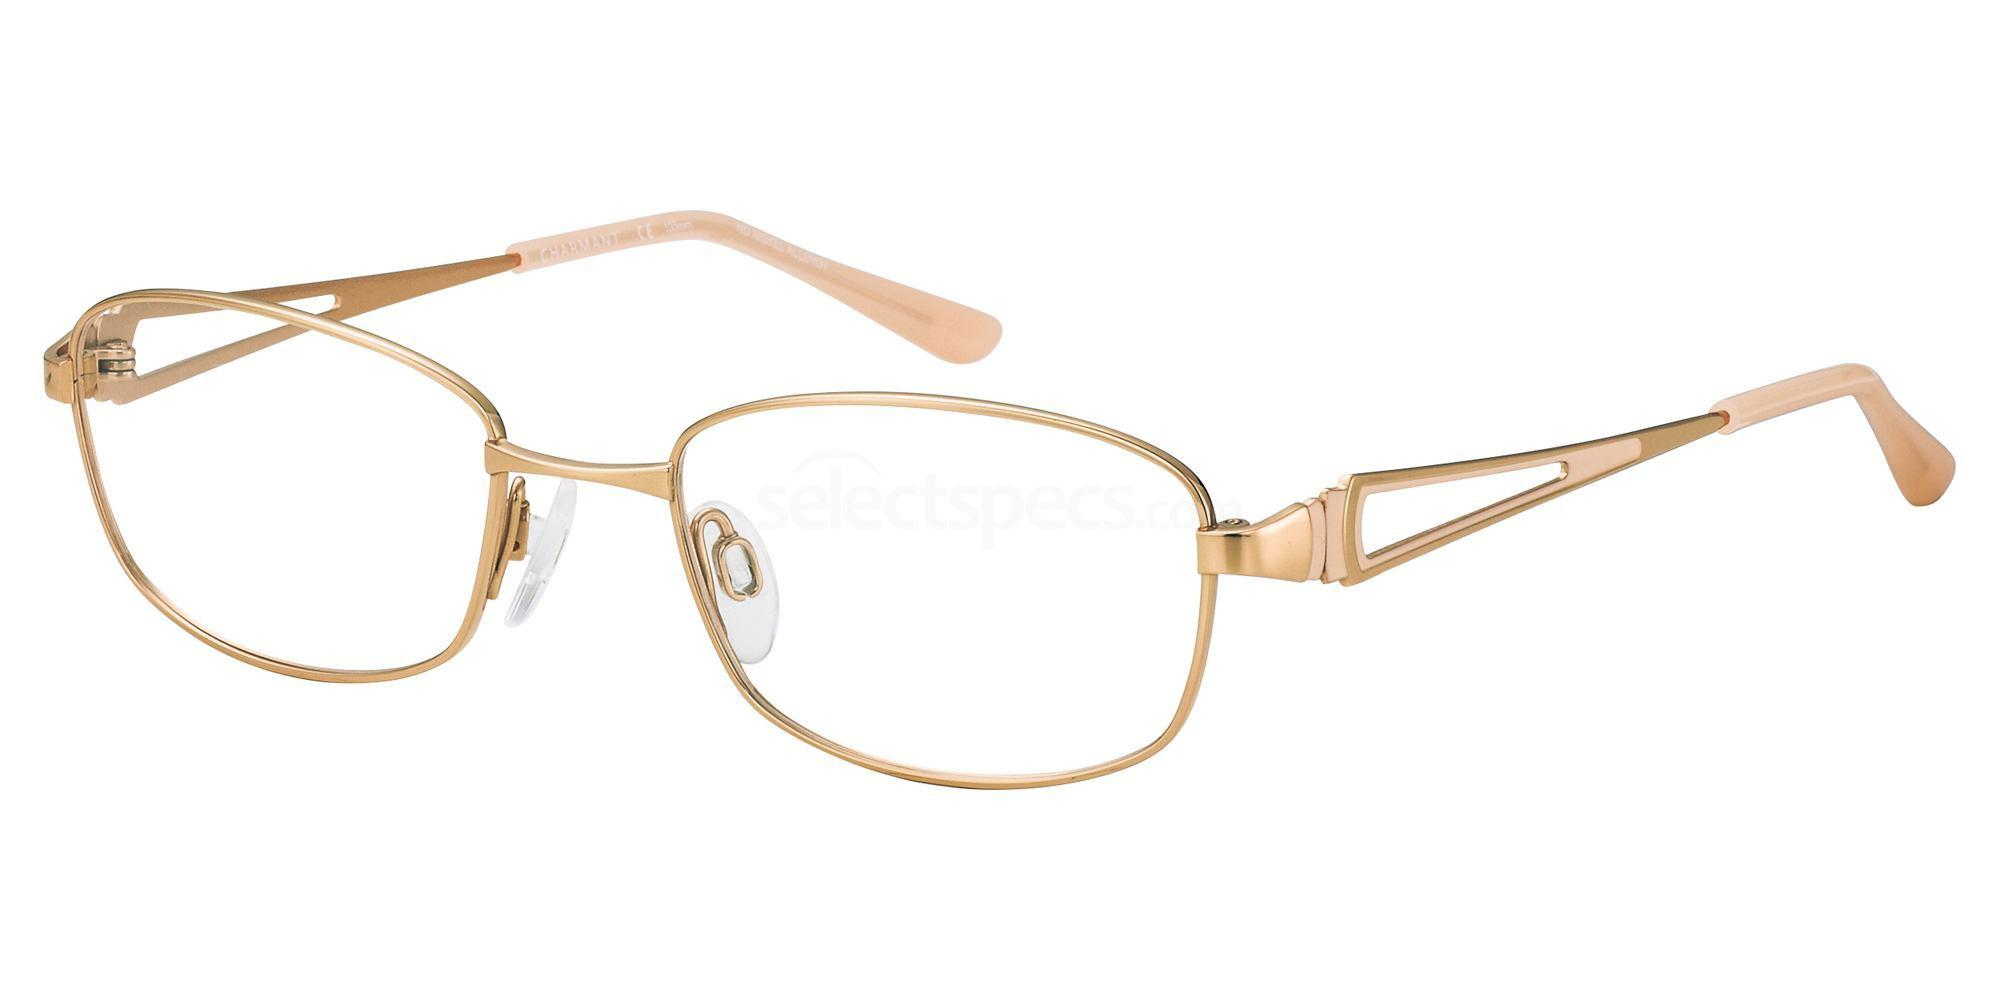 GP CH12128 Glasses, Charmant Titanium Perfection